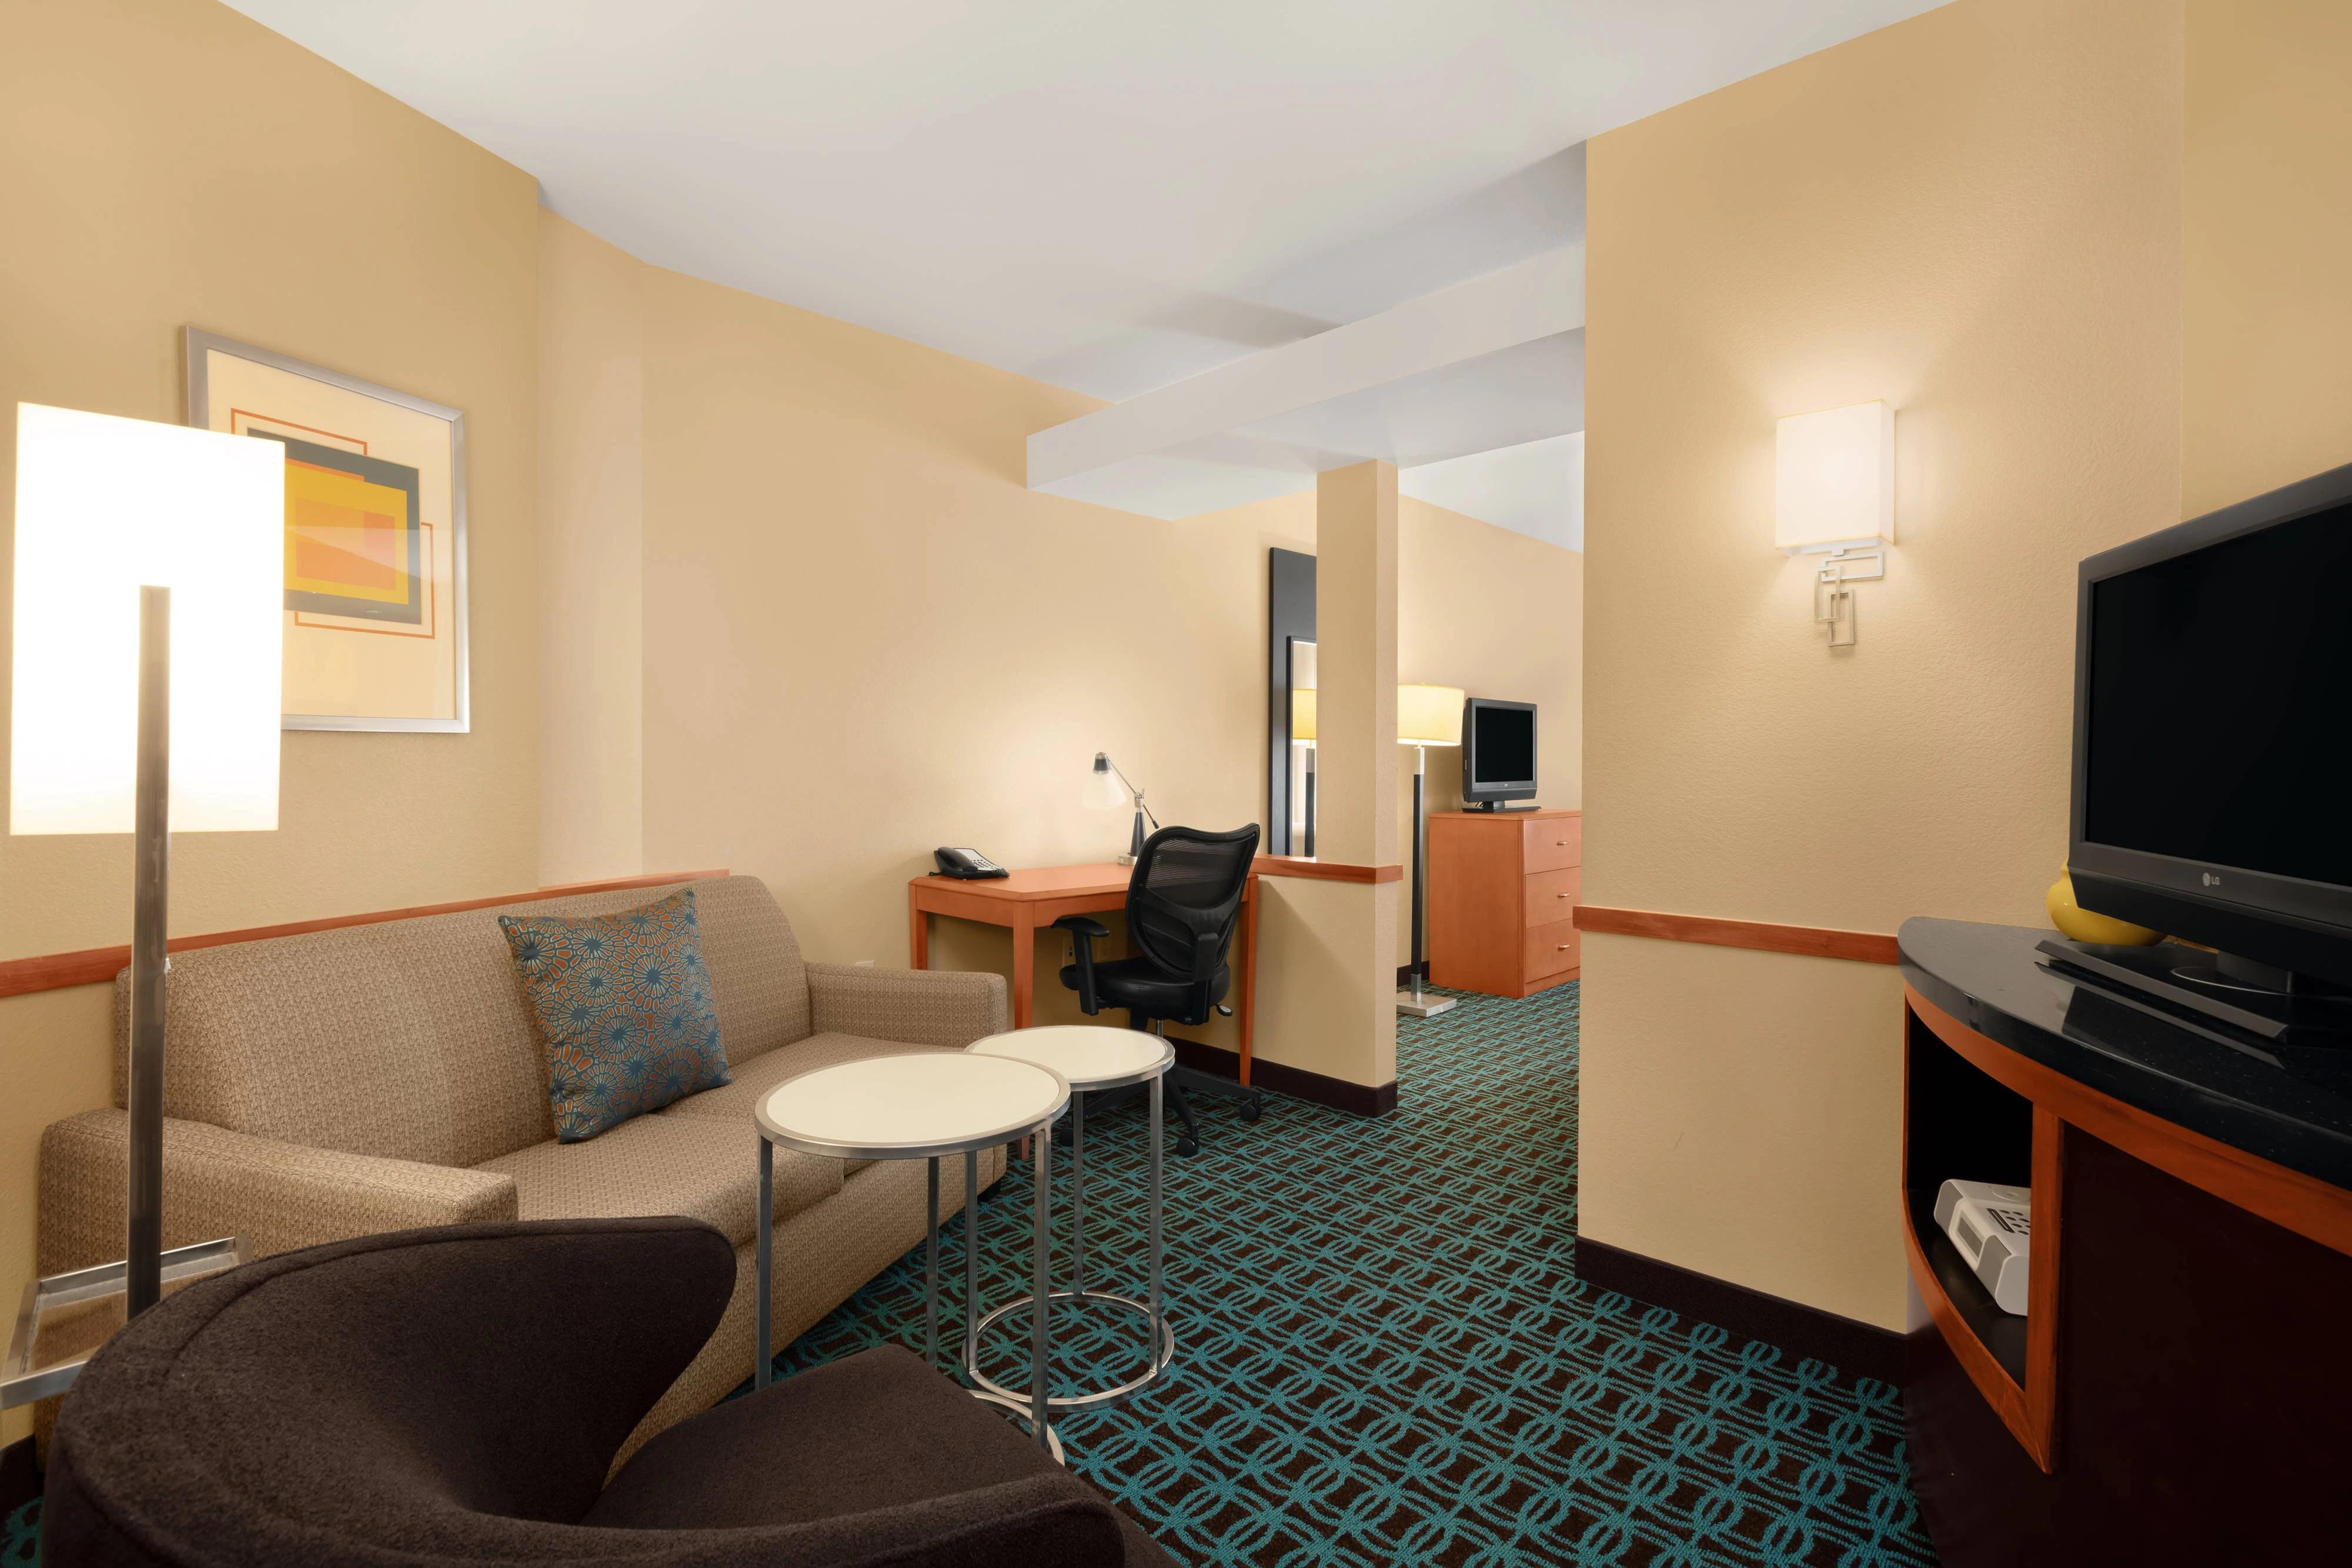 Historic St. Augustine Hotels Fairfield Inn & Suites St